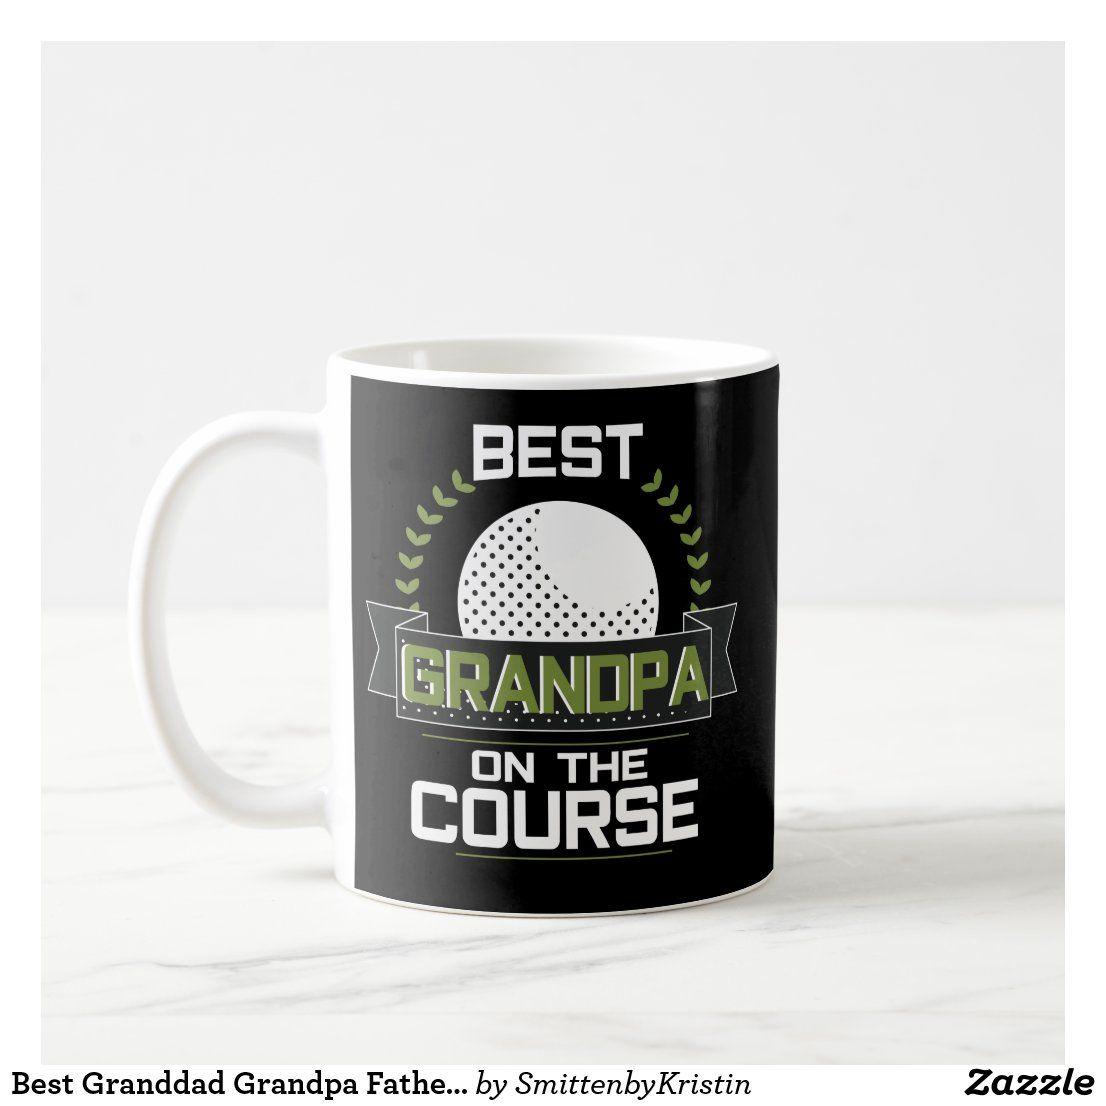 Best granddad grandpa fathers day coffee mug golf zazzle